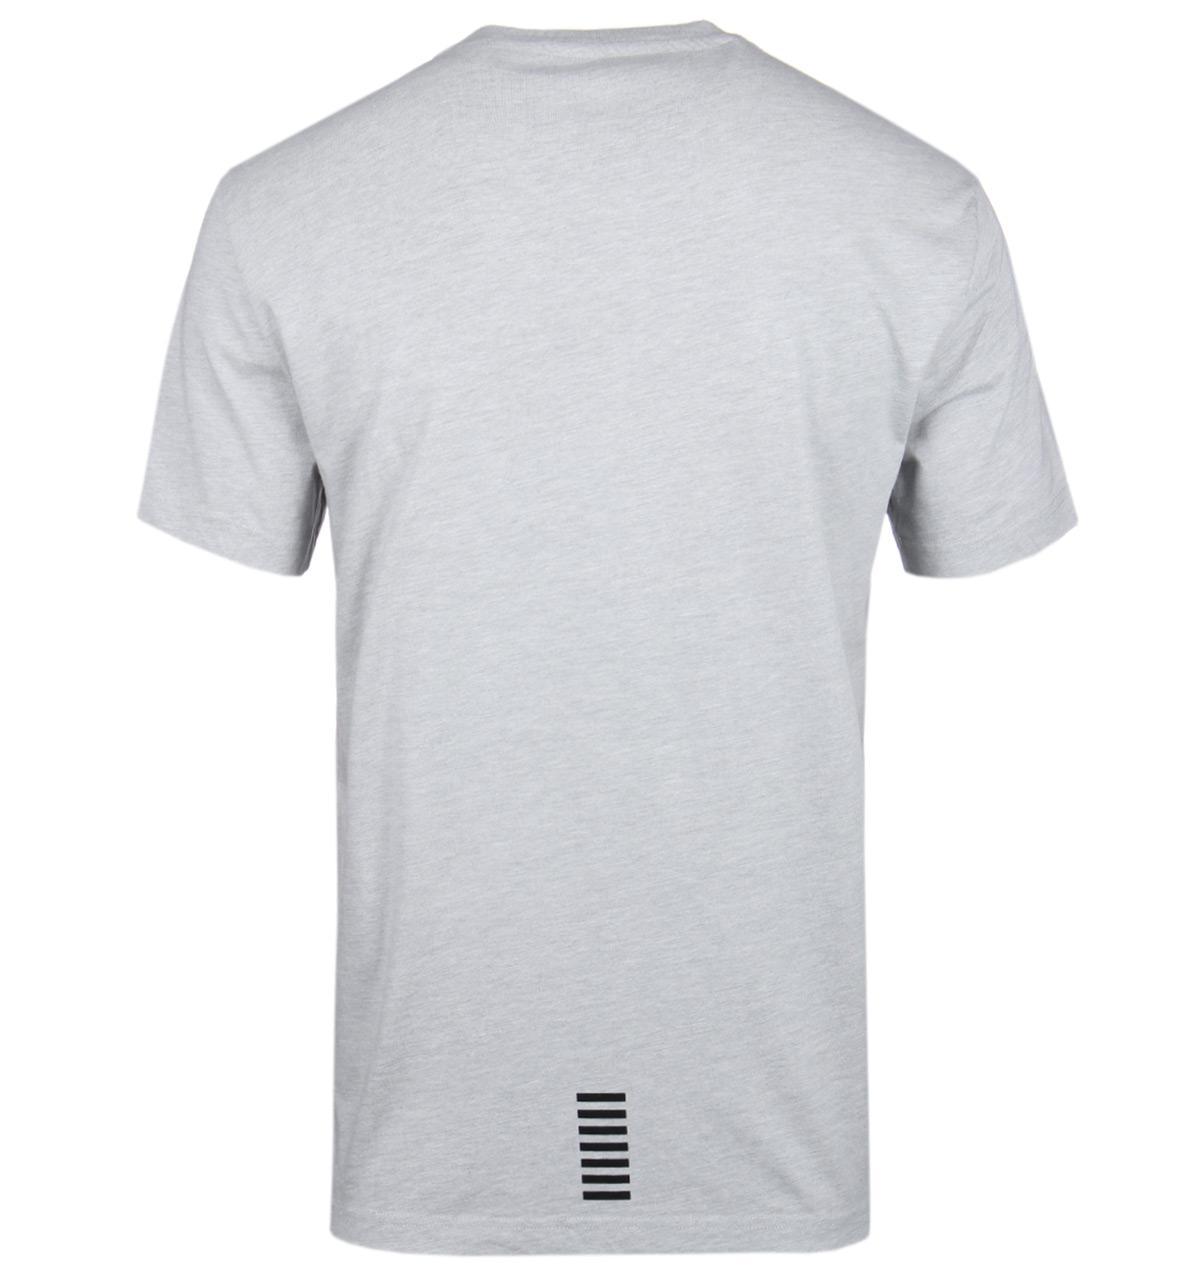 6788a77d4 EA7 Light Grey Melange Iconic Logo Crew Neck T-shirt in Gray for Men ...